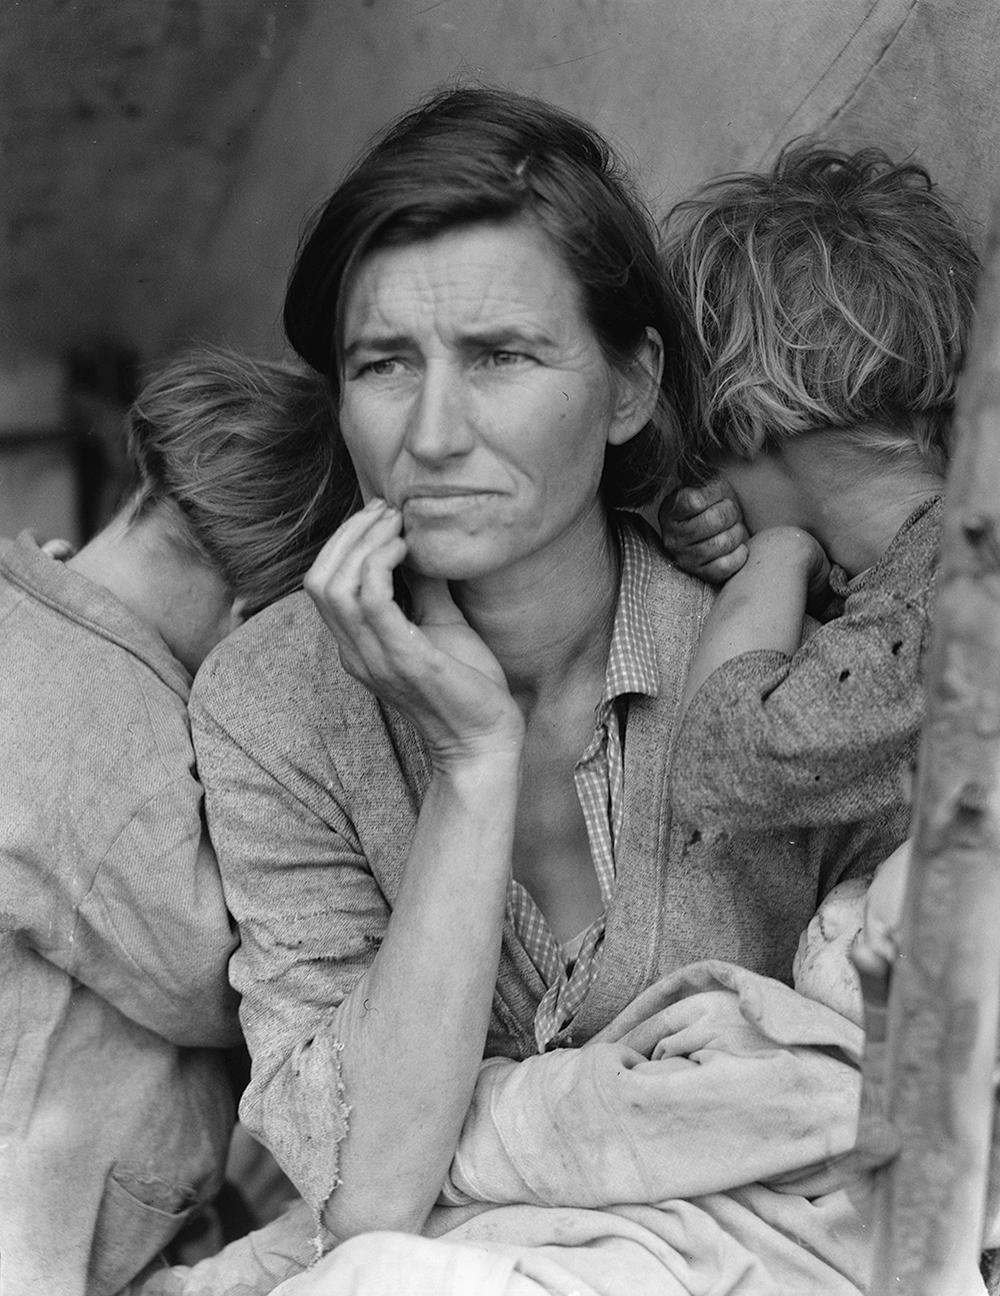 Dorothea Lange's America